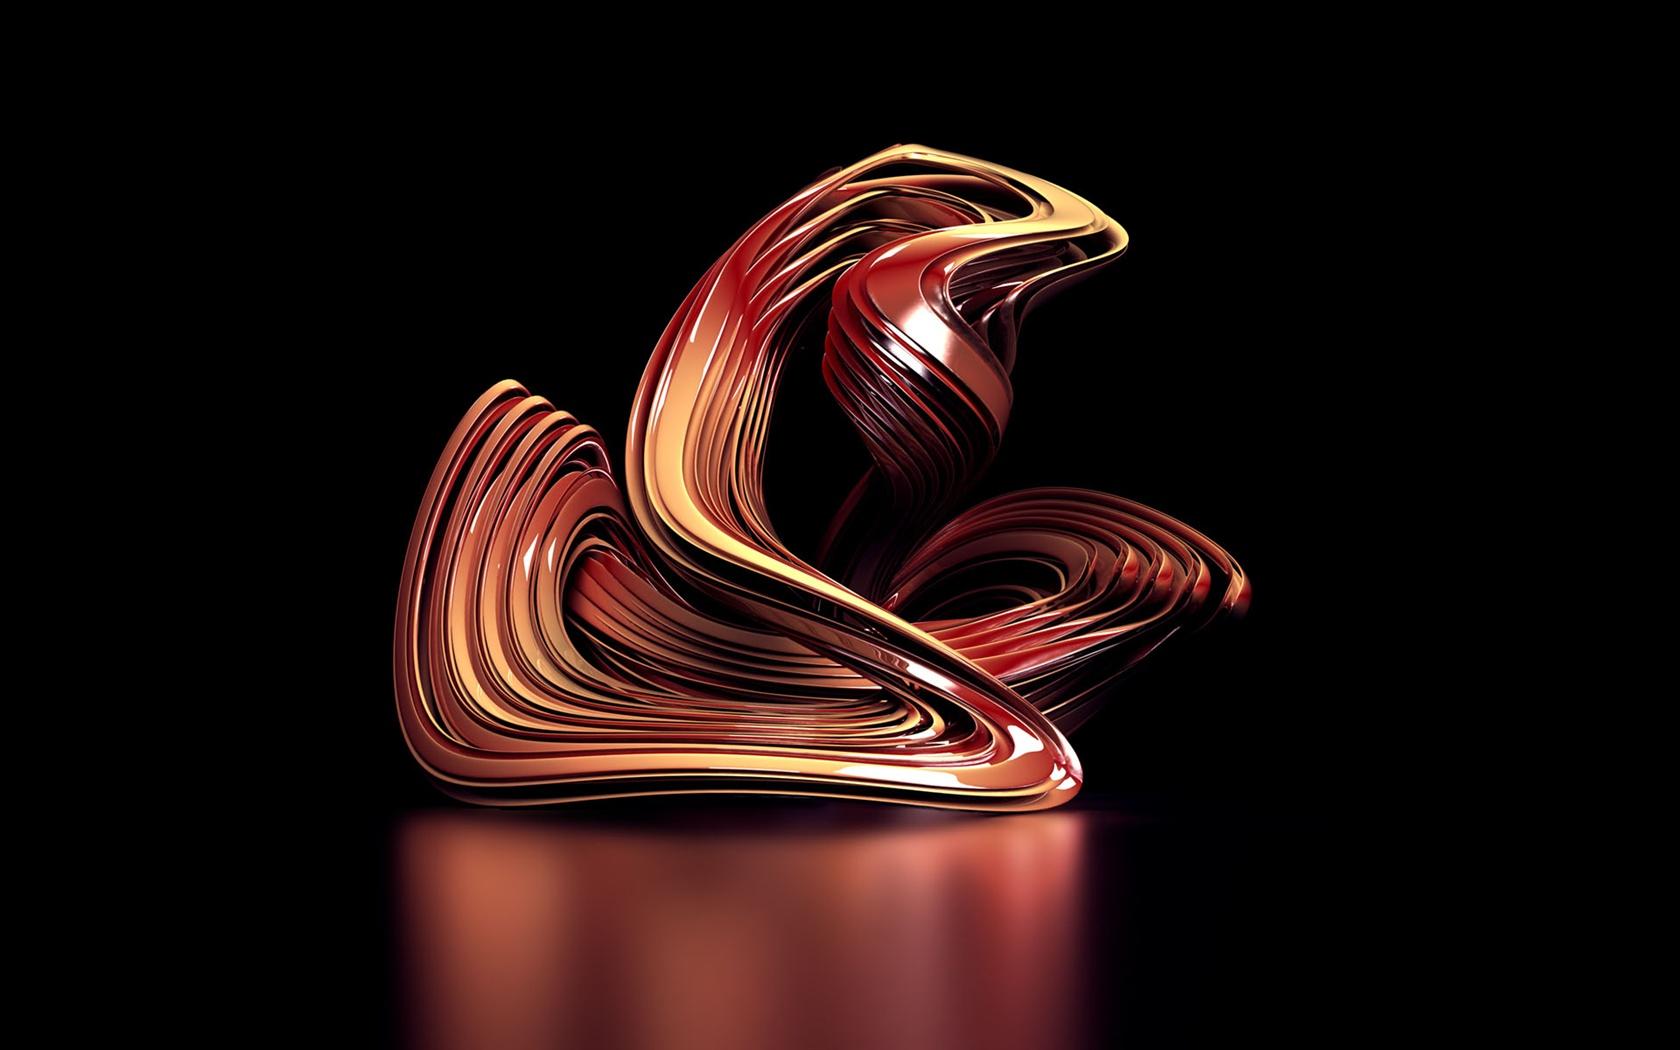 3D Courbe Abstraite Fonds D&233cran  1680x1050 D